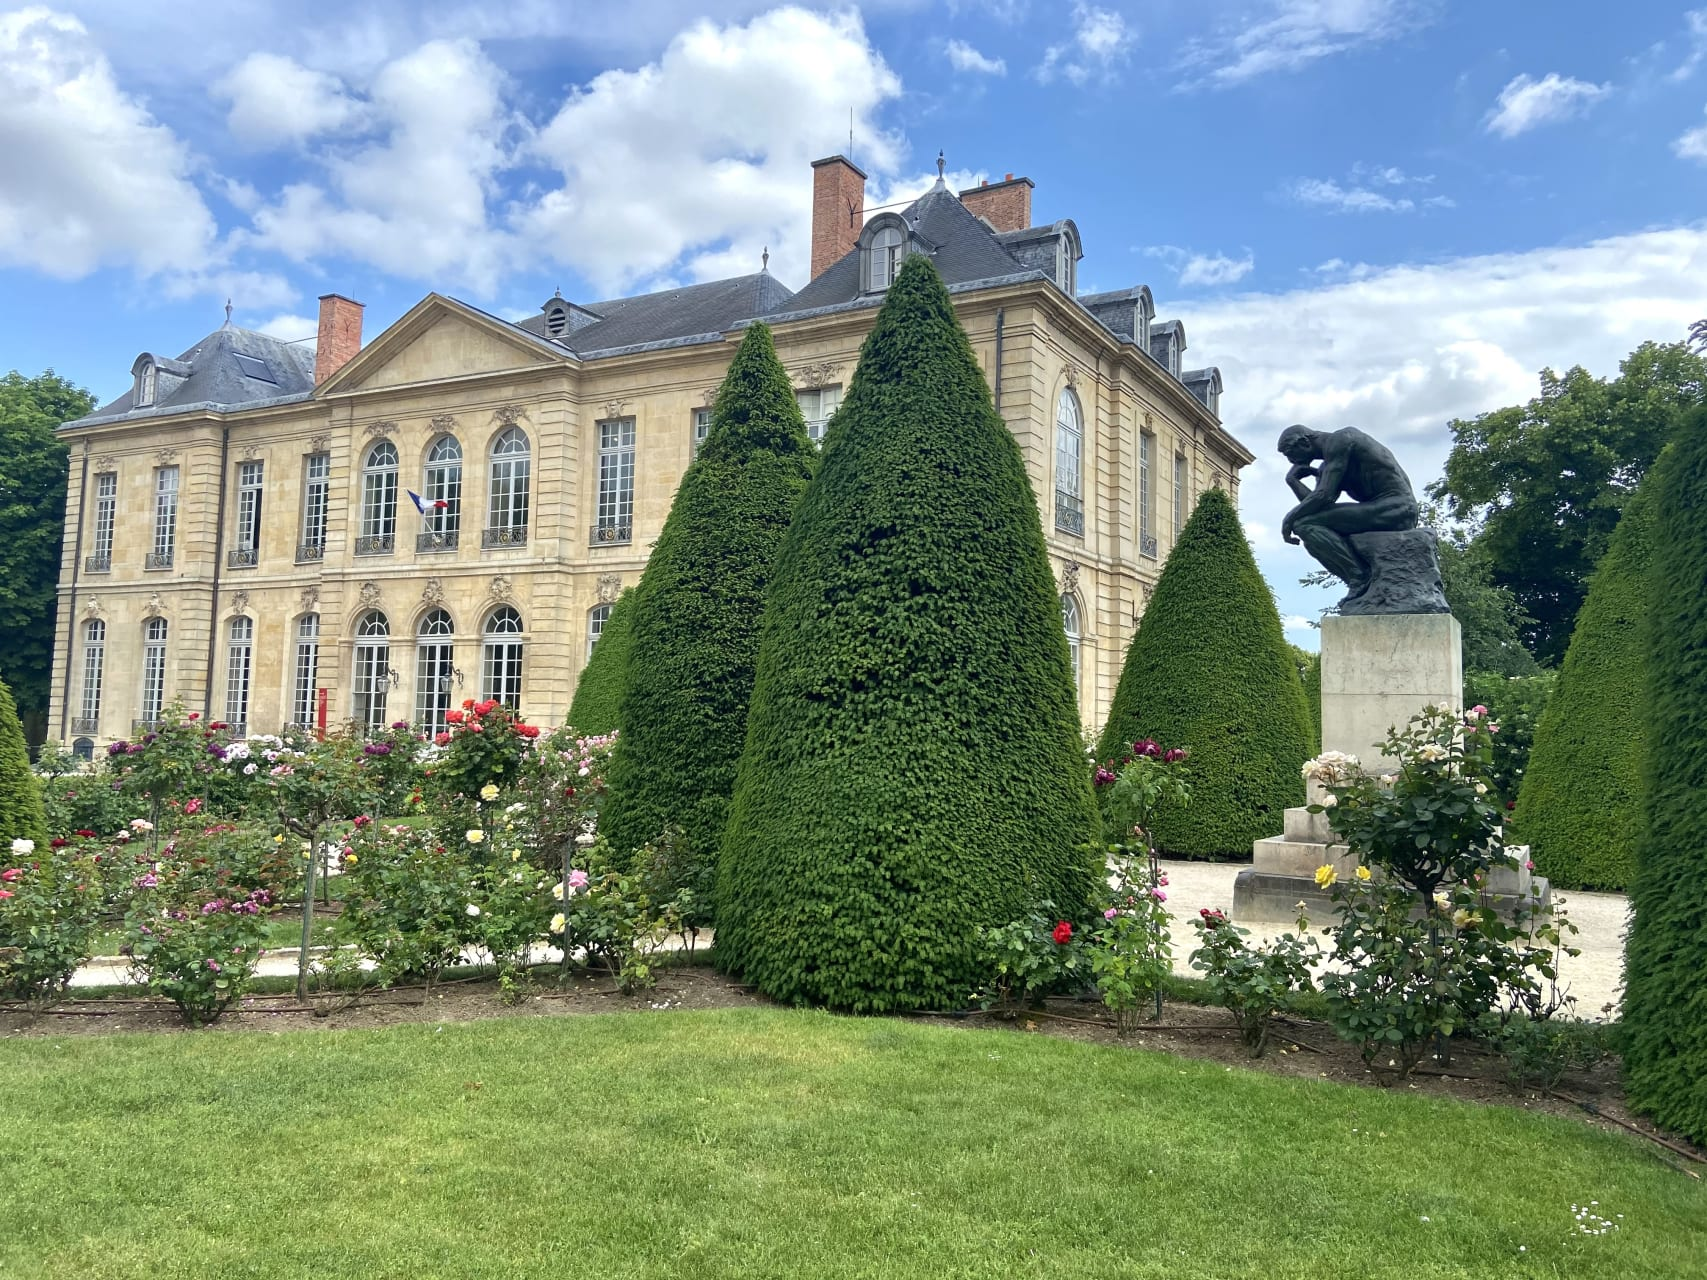 Paris - The Rodin Museum